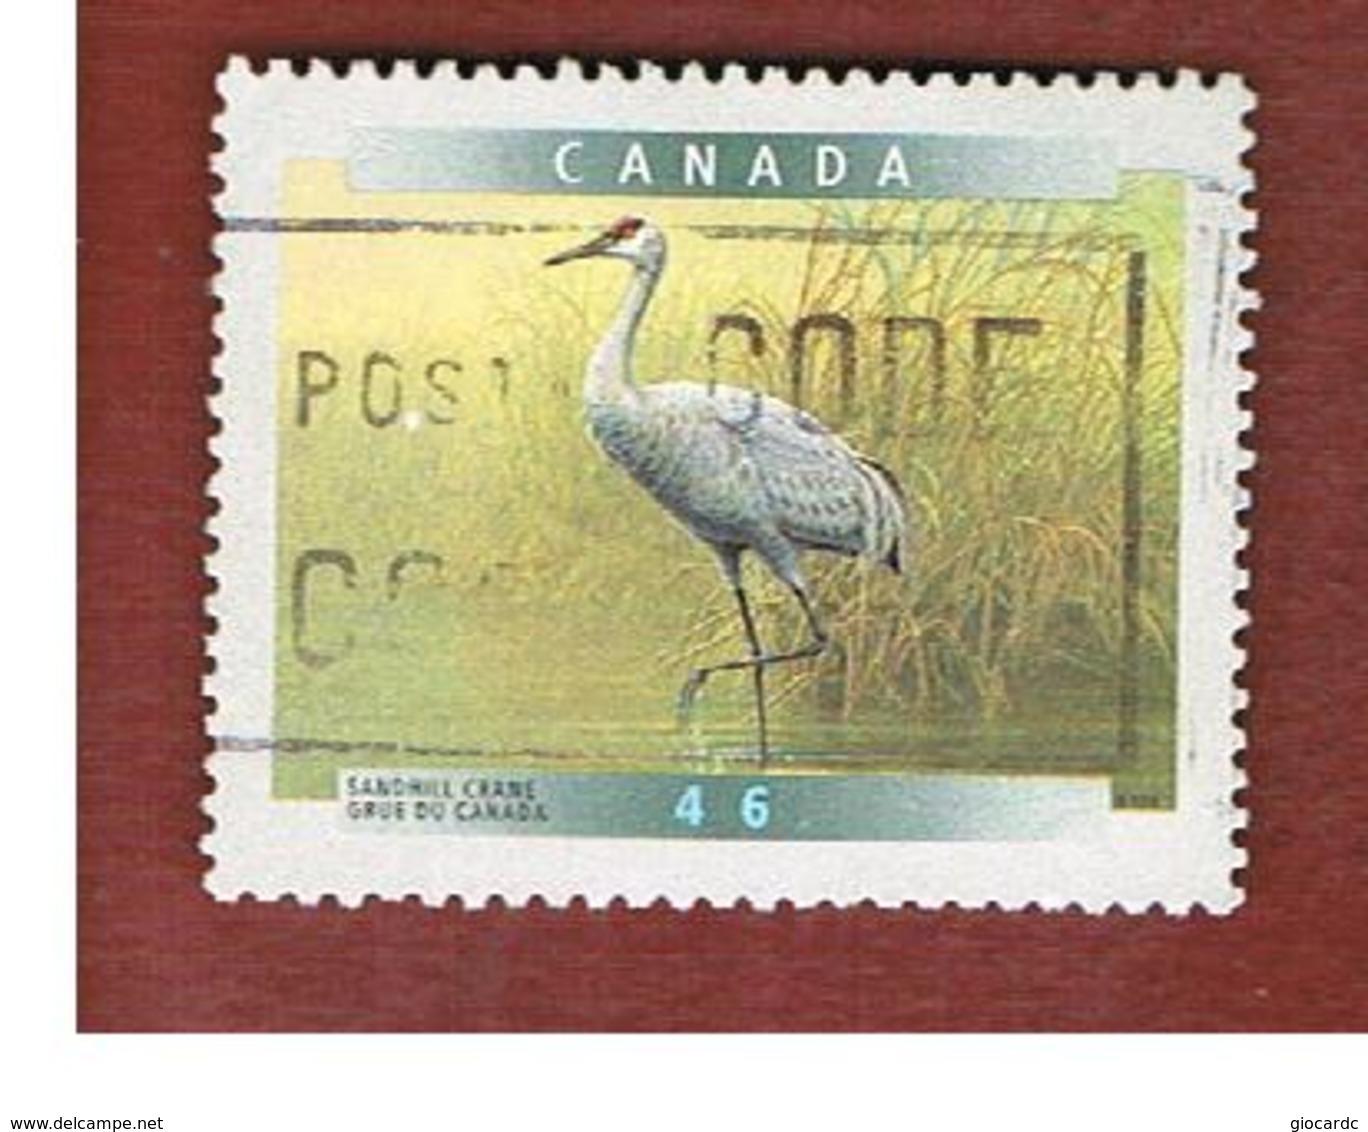 CANADA   -  SG 1868  -  1999   CANADIAN BIRDS: SANDHILL CRANE                -      USED - 1952-.... Regno Di Elizabeth II